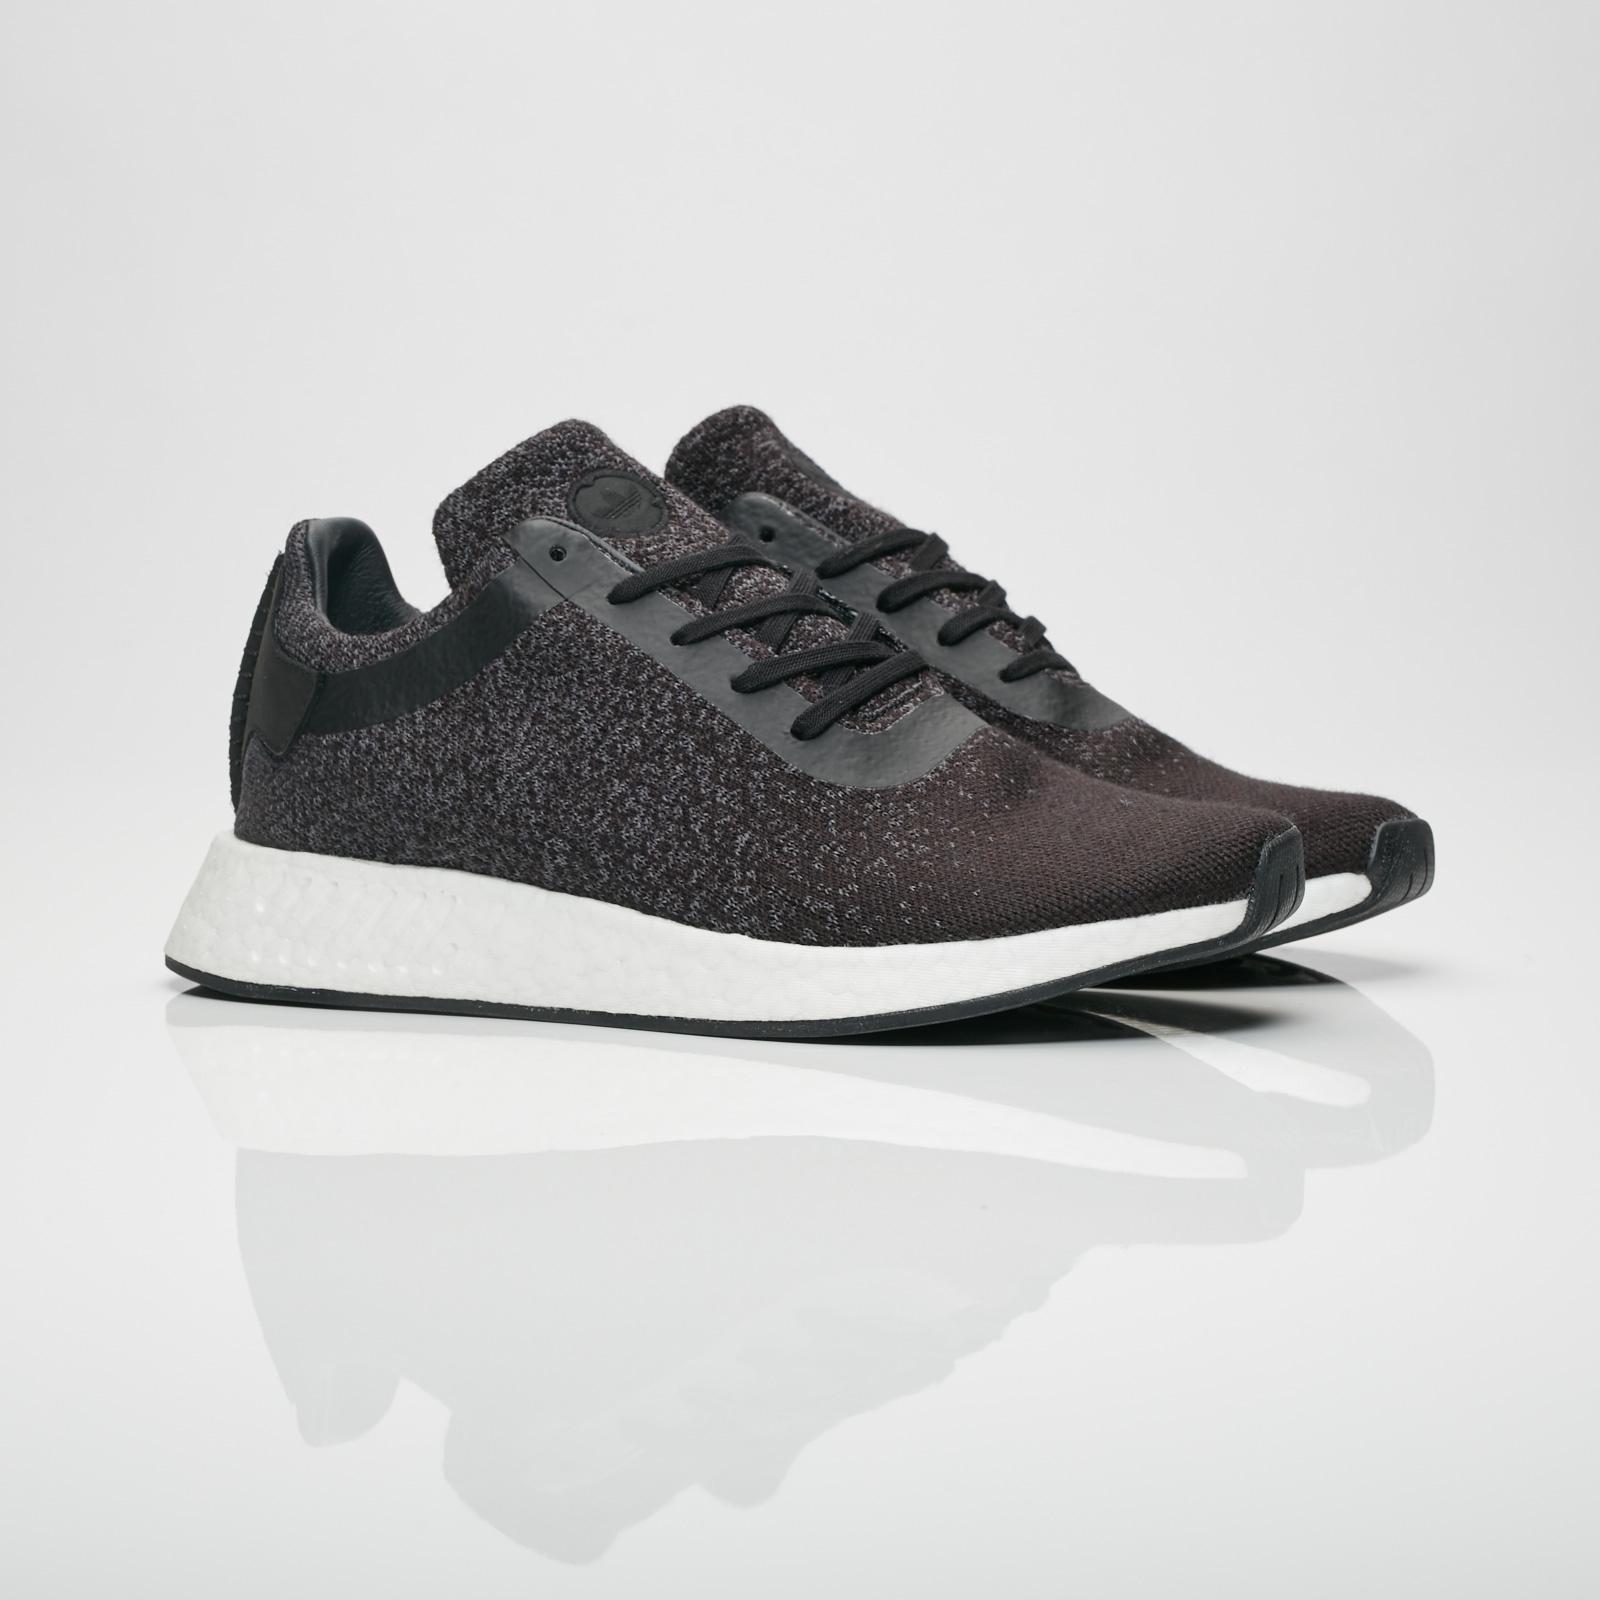 f54b4d23060547 adidas NMD R2 PK - Cp9550 - Sneakersnstuff